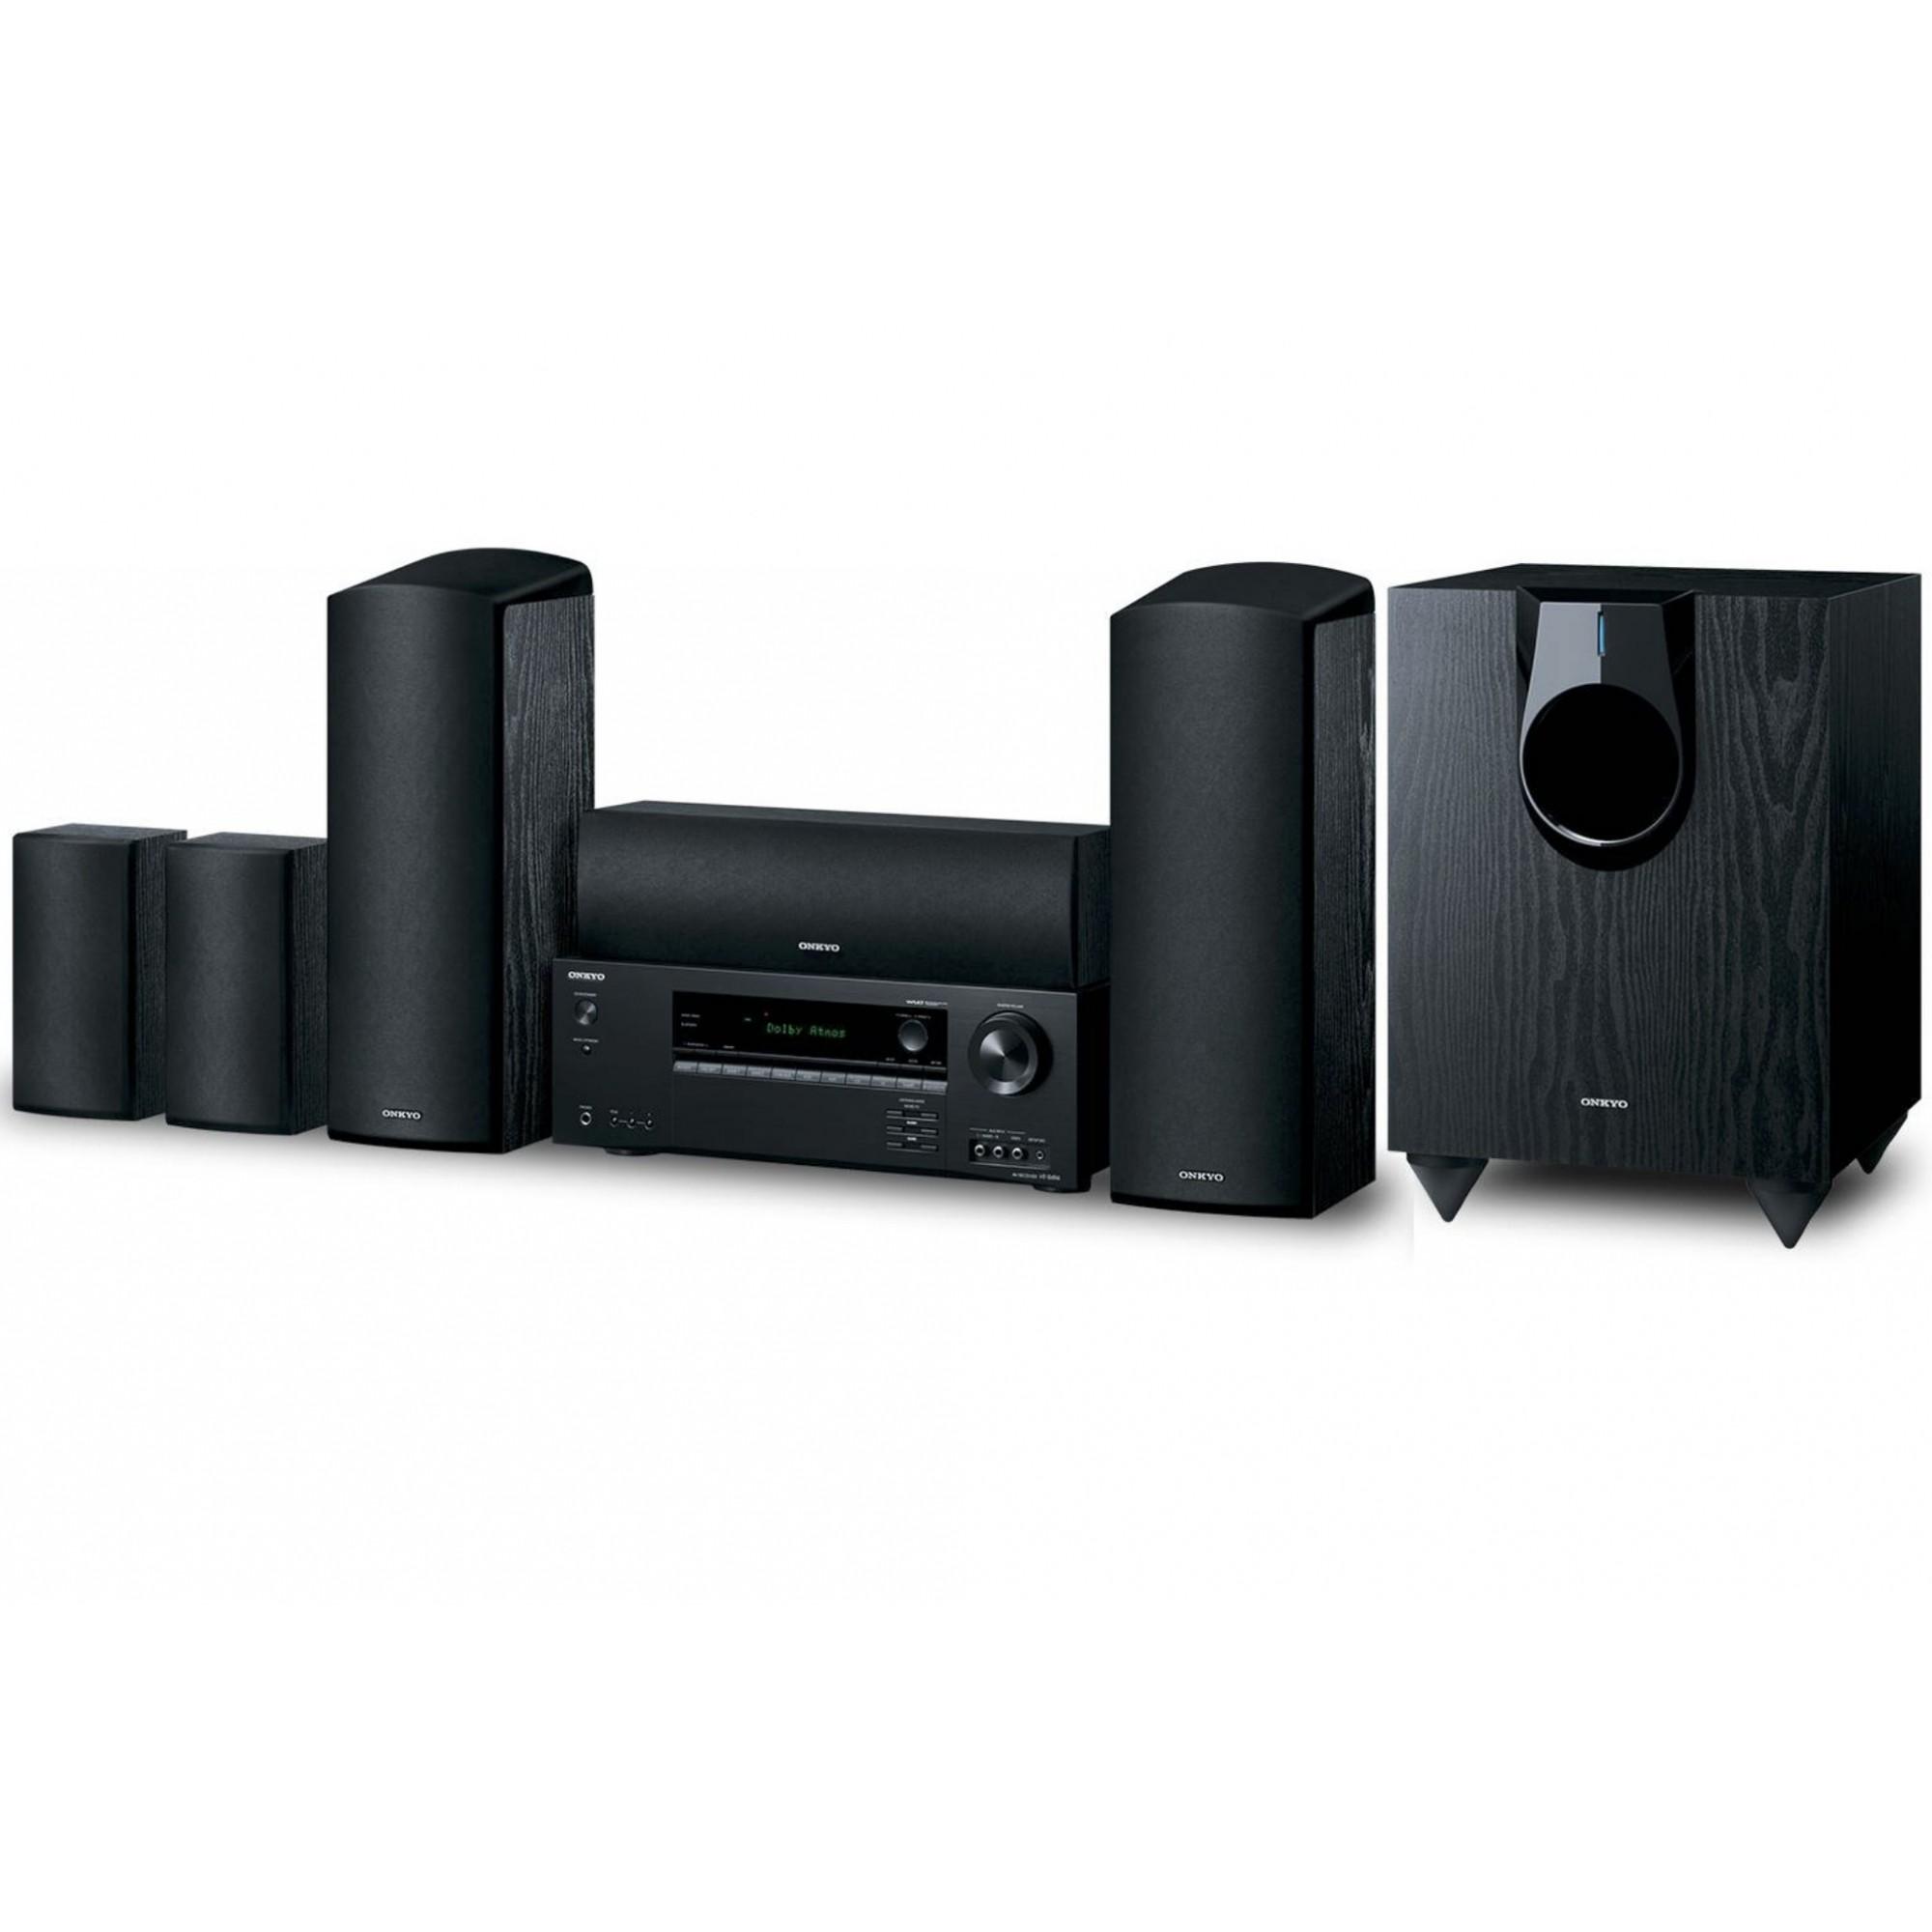 Home Theater 5.1.2ch Dolby Atmos Onkyo HT-S5910 Zona B 4K Bluetooth - 110v